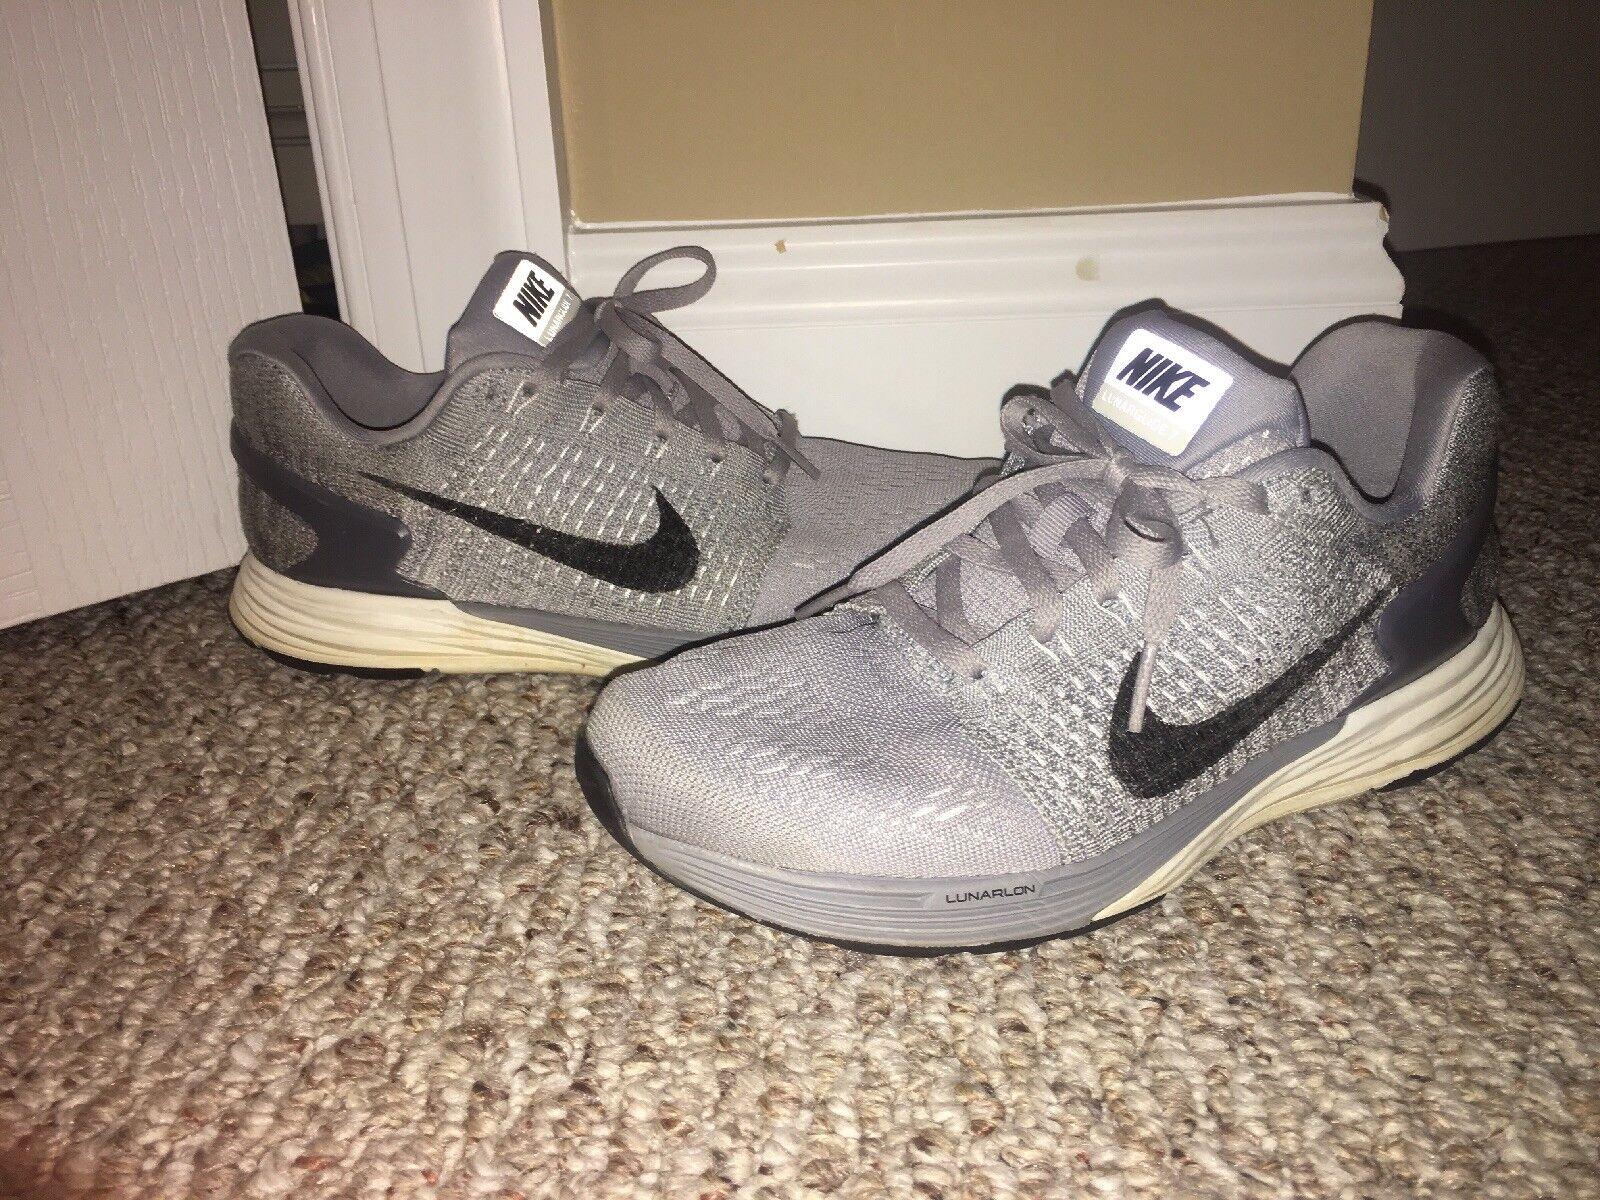 best website 07bab f4e19 Women s Nike Womens Lunarglide 7.5 Gray Athletic Shoes b95c76. Nike Air  Jordan 1 Retro ...